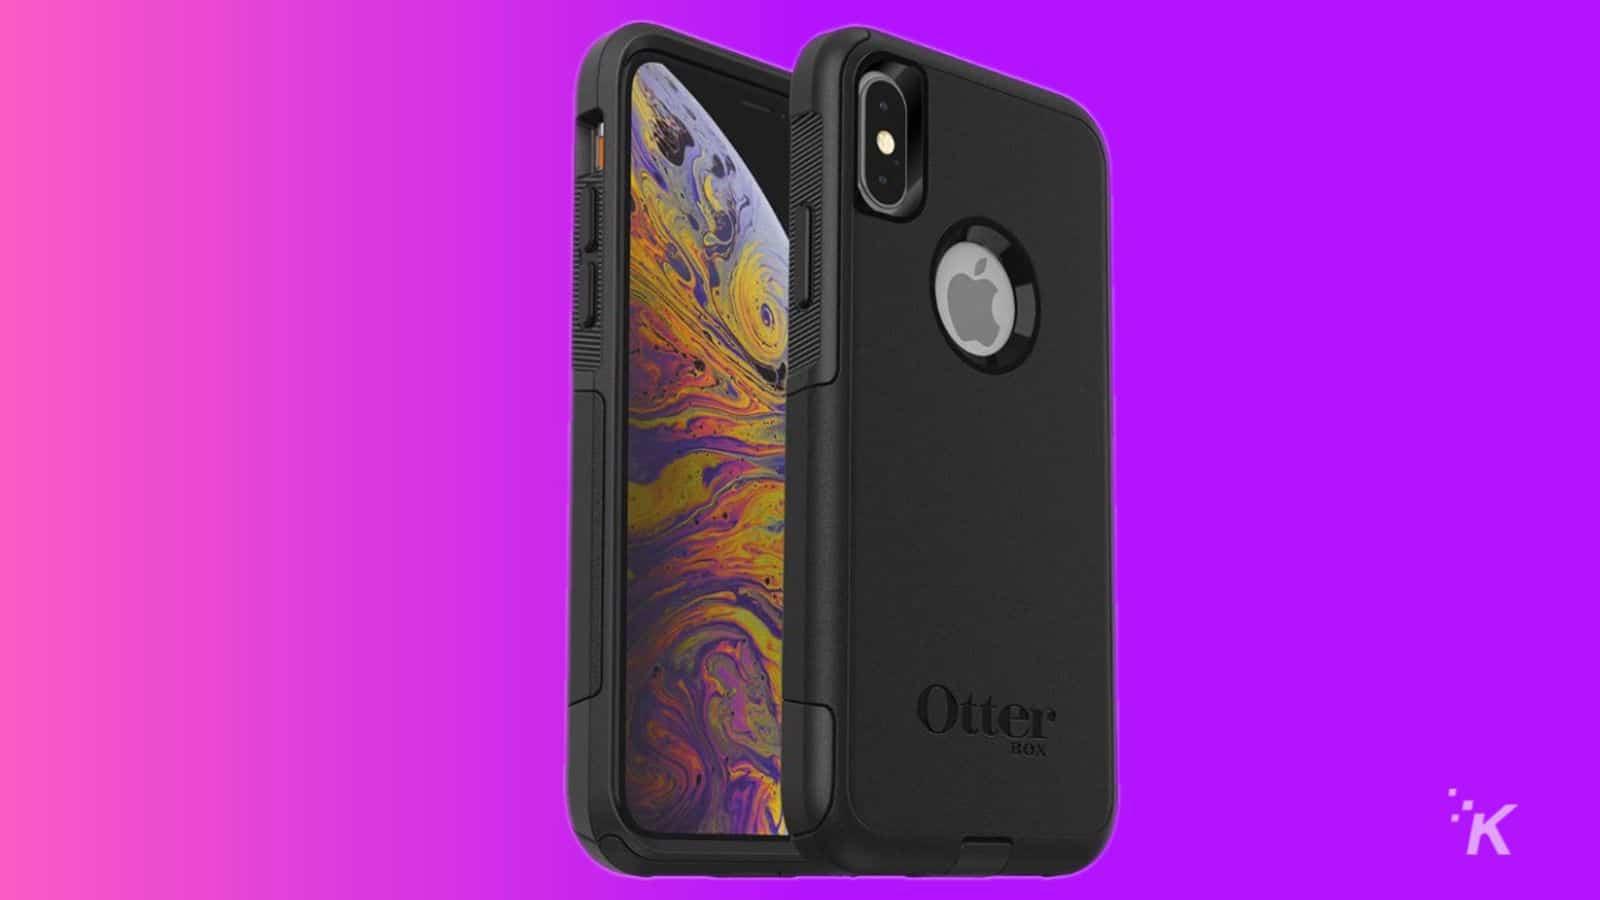 otterbox commuter best iphone xs case